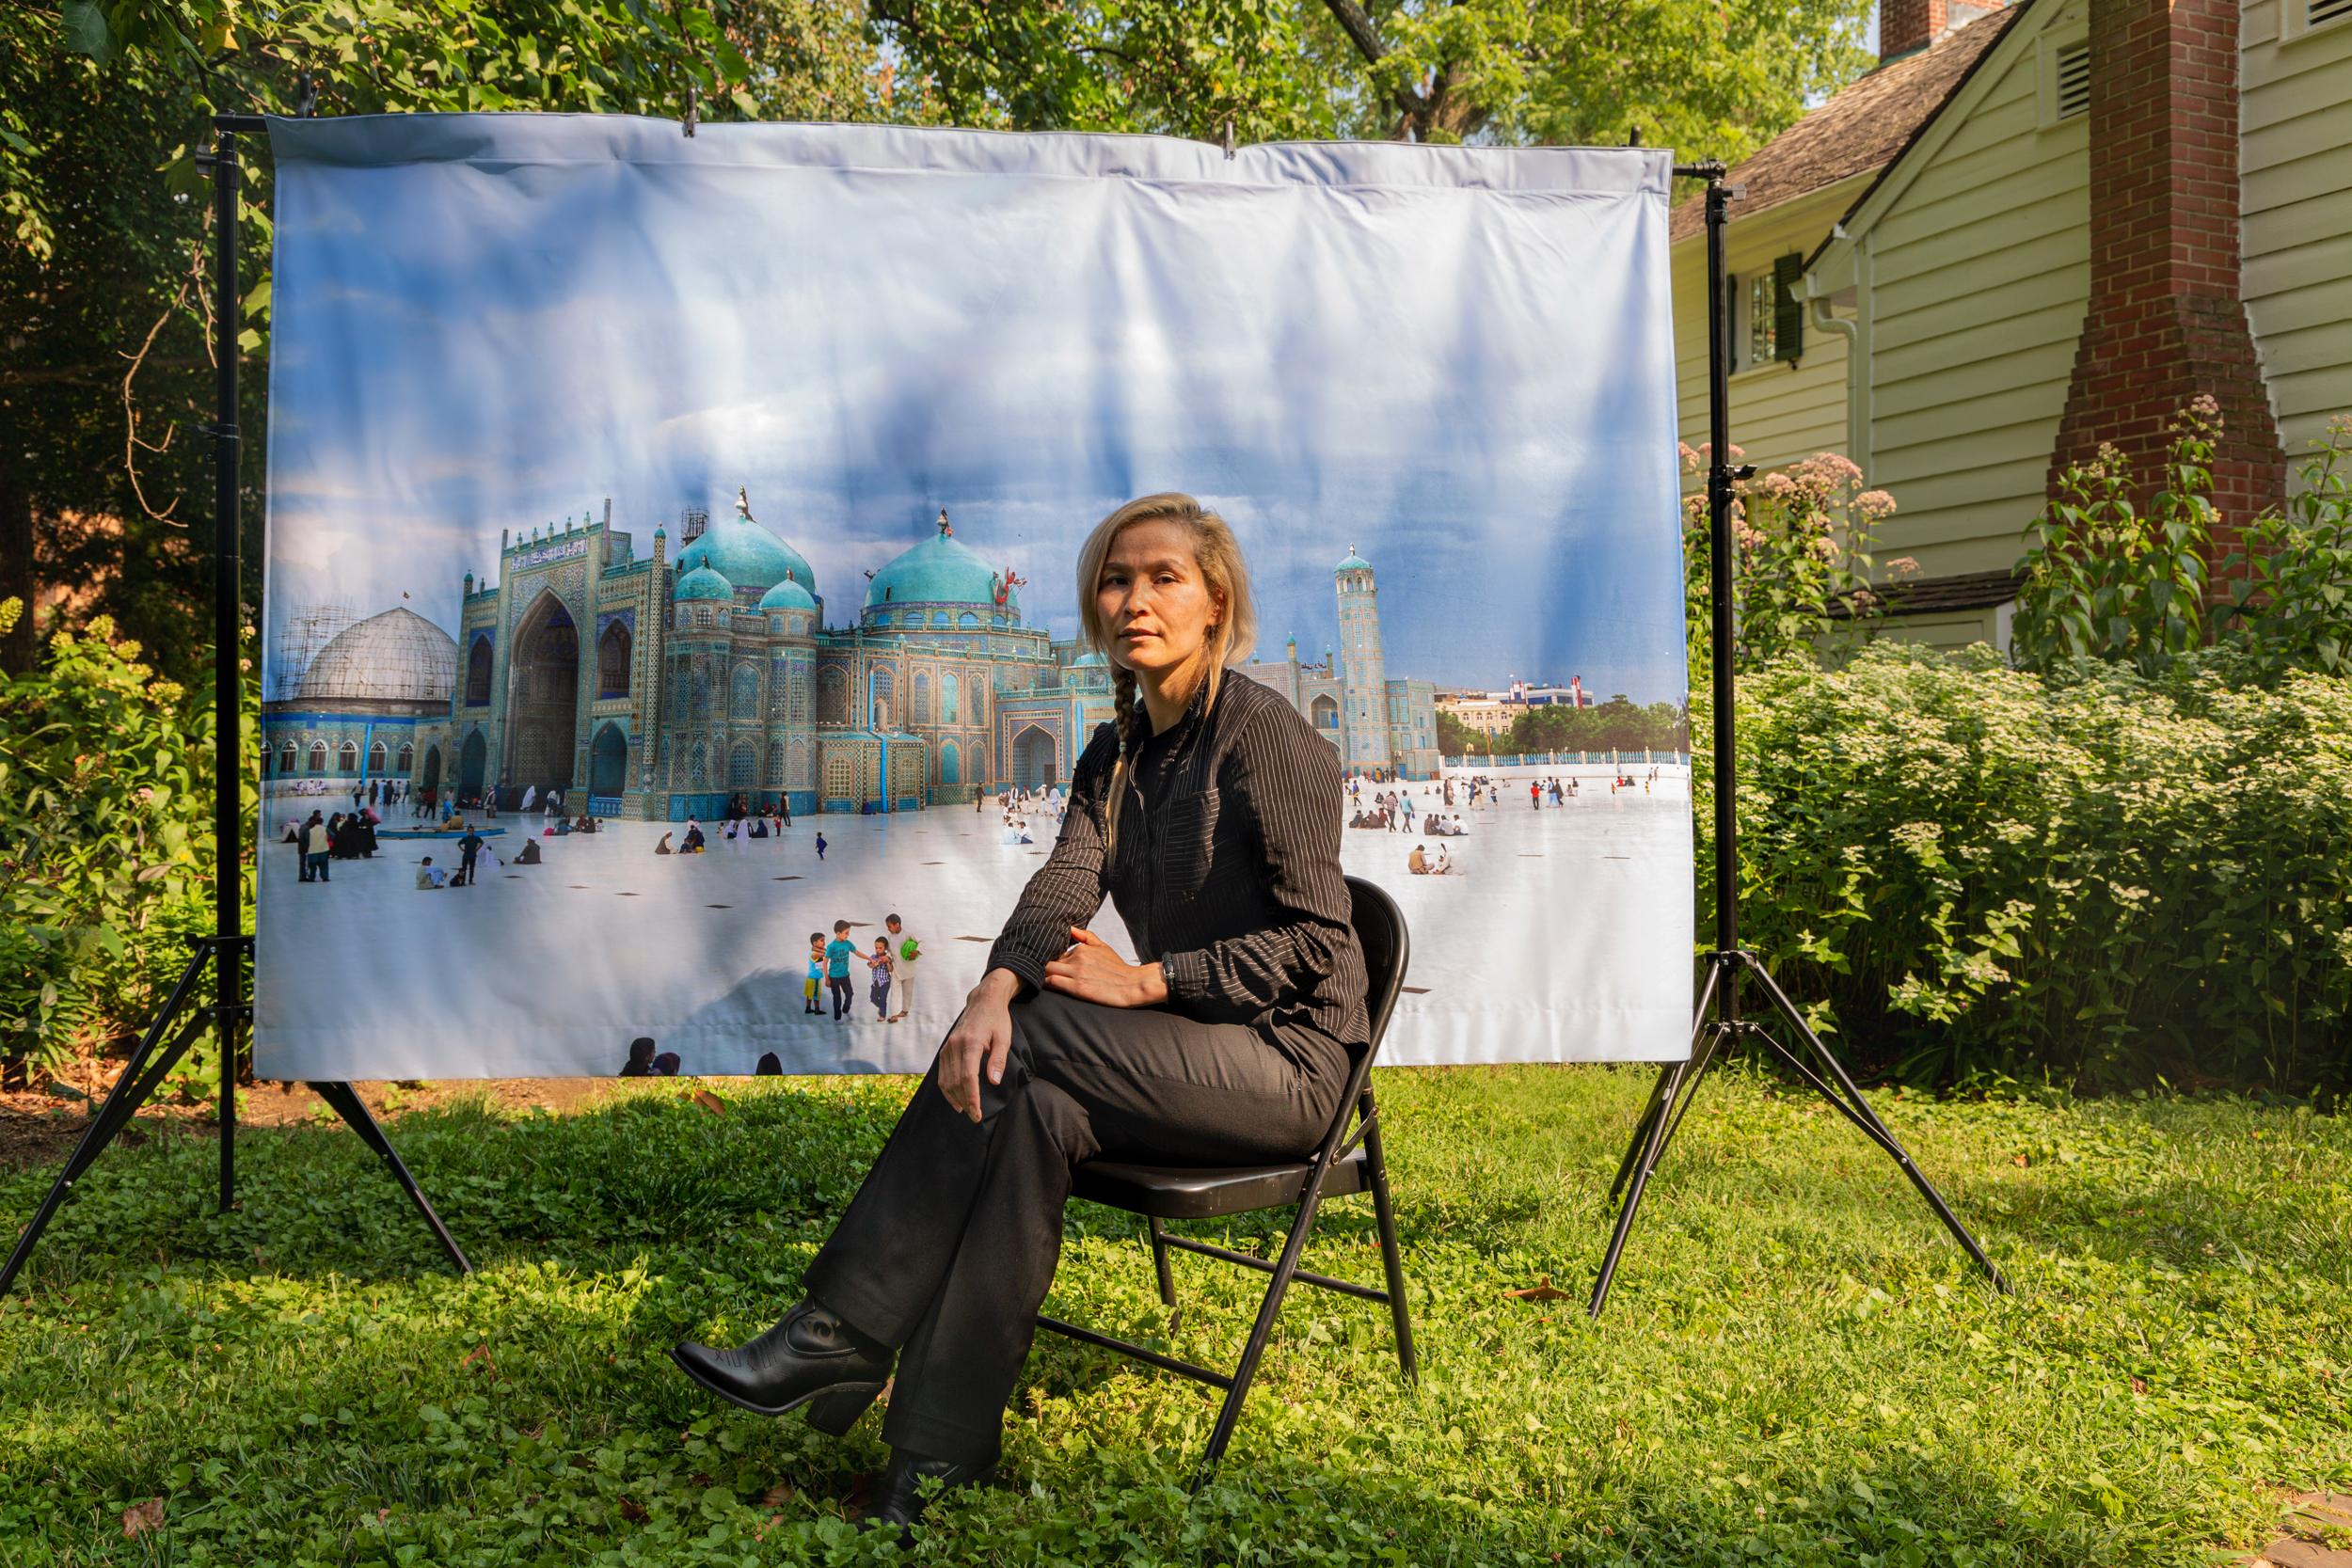 Hadia Essazada (Photograph by Farrah Skeiky; mural photograph: Wasim Mirzaie)